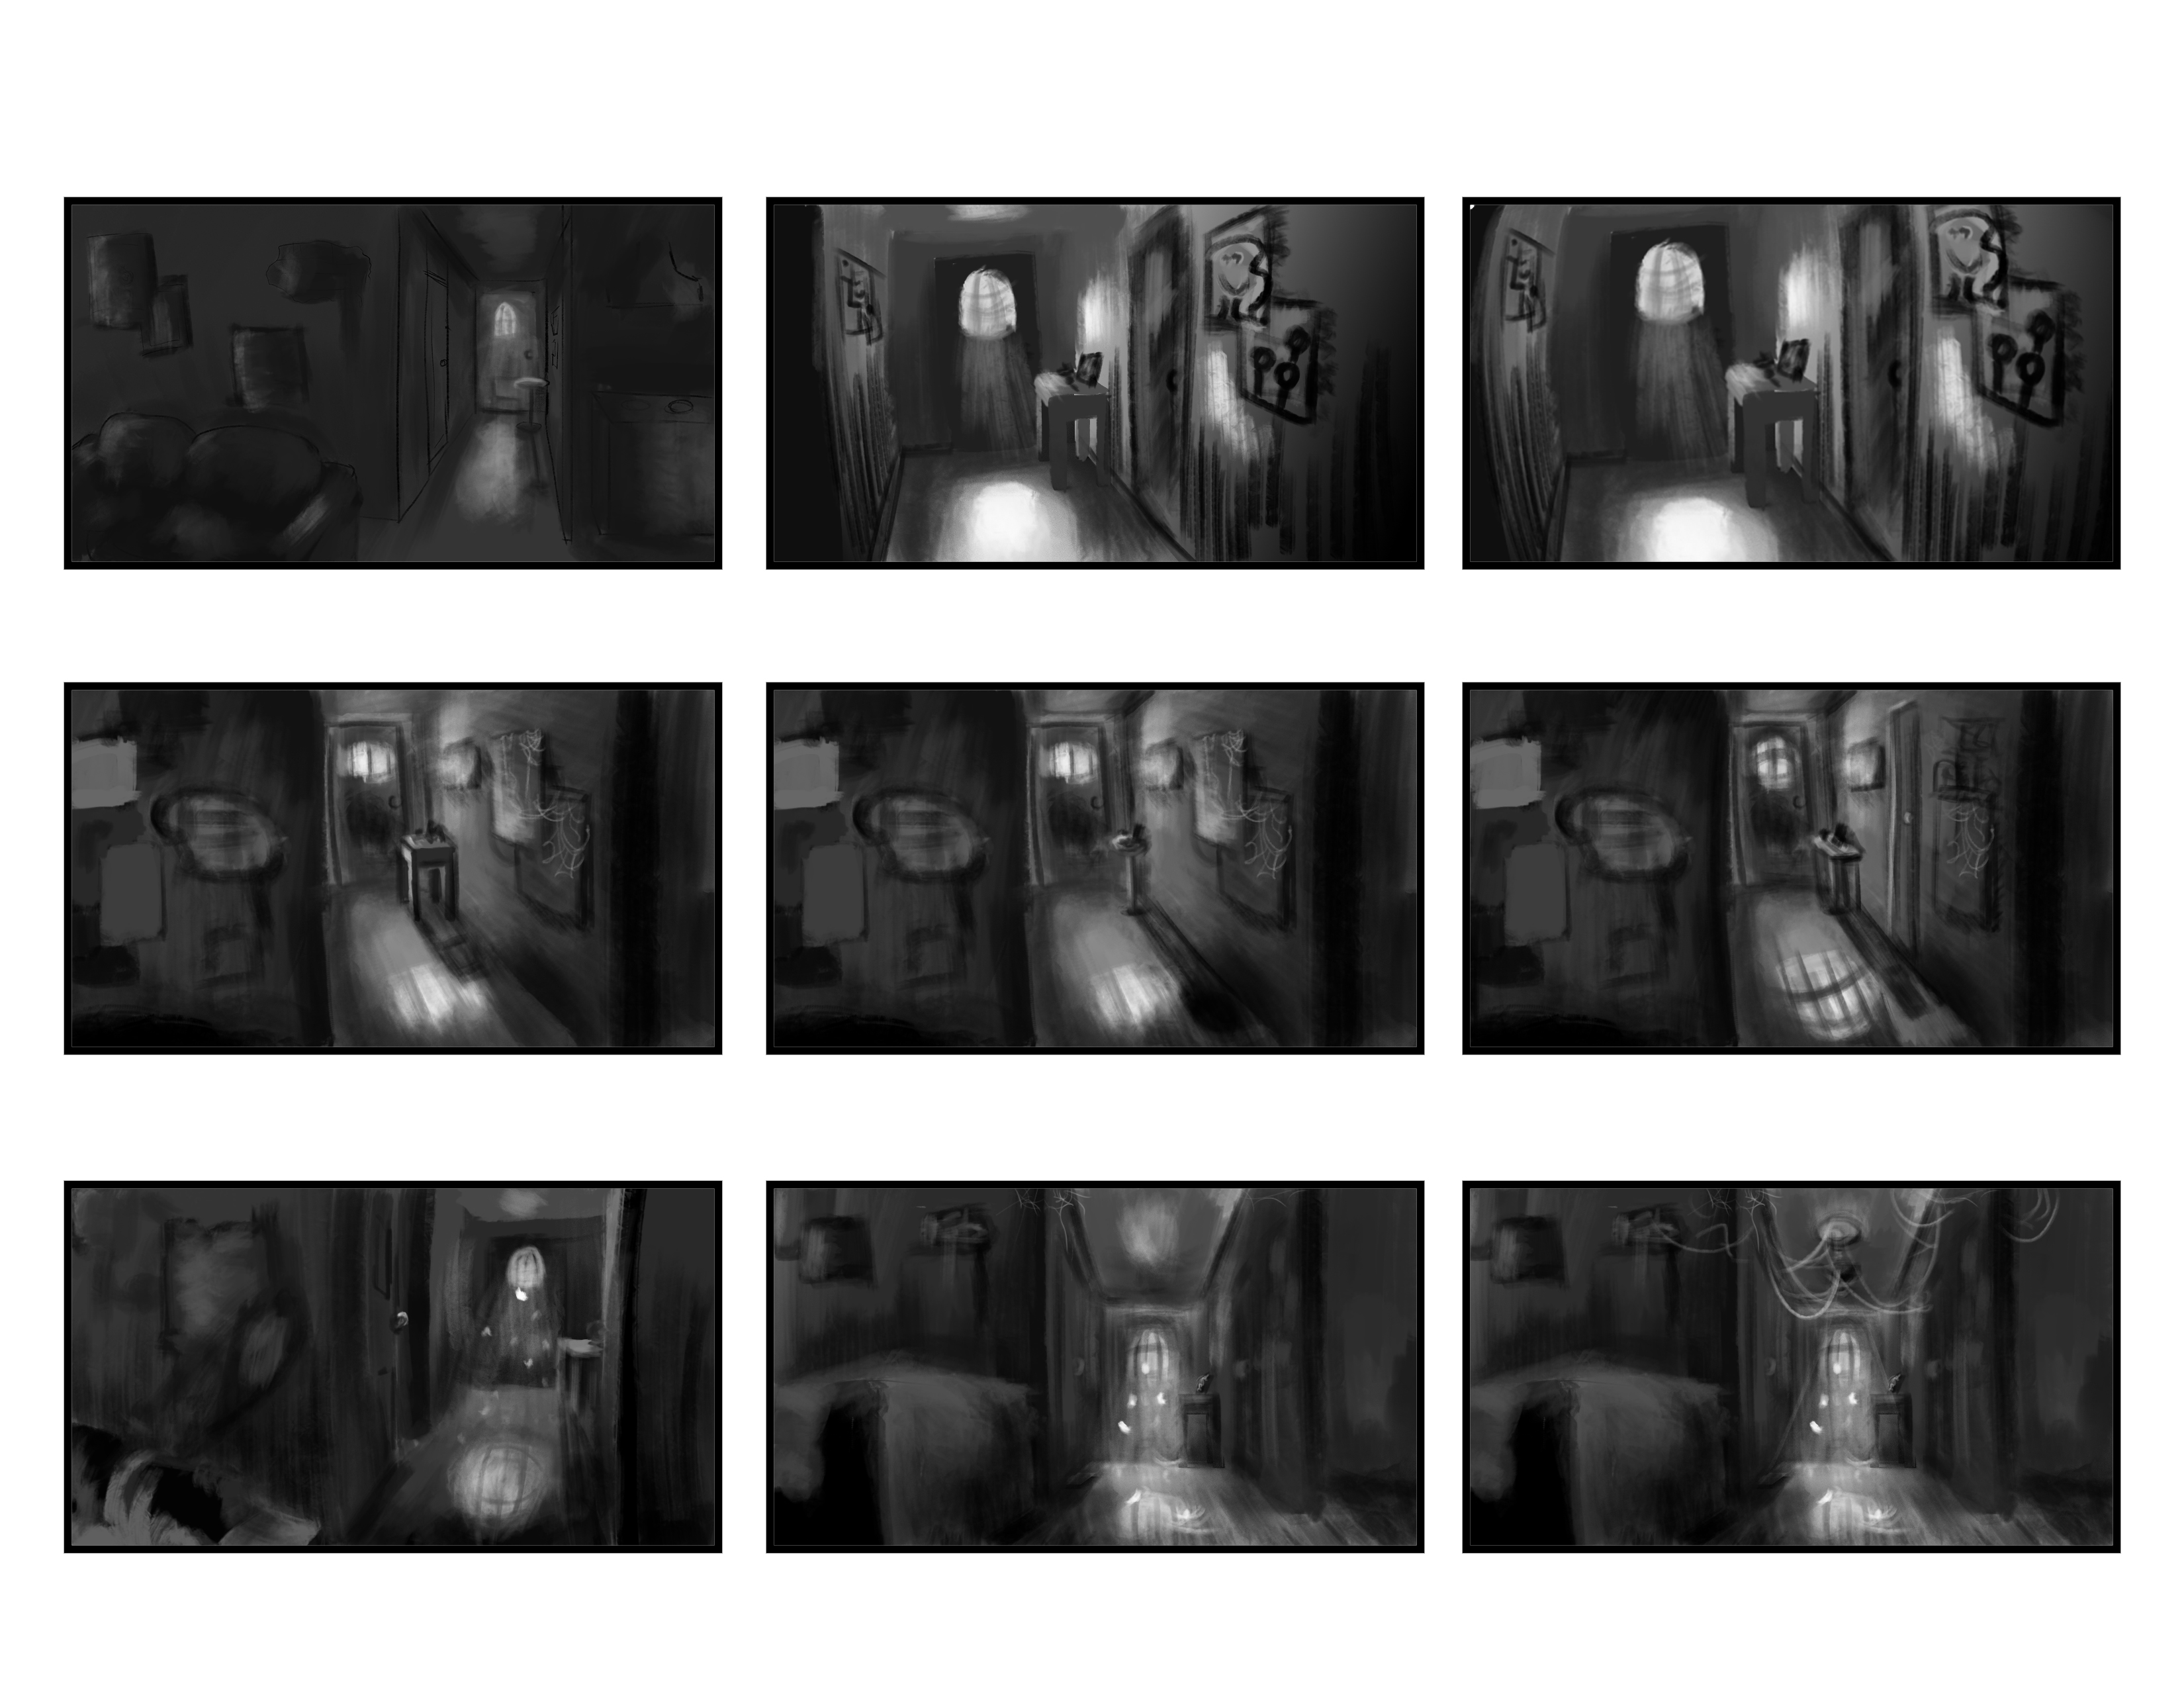 Hallway: Shape and Lighting Studies